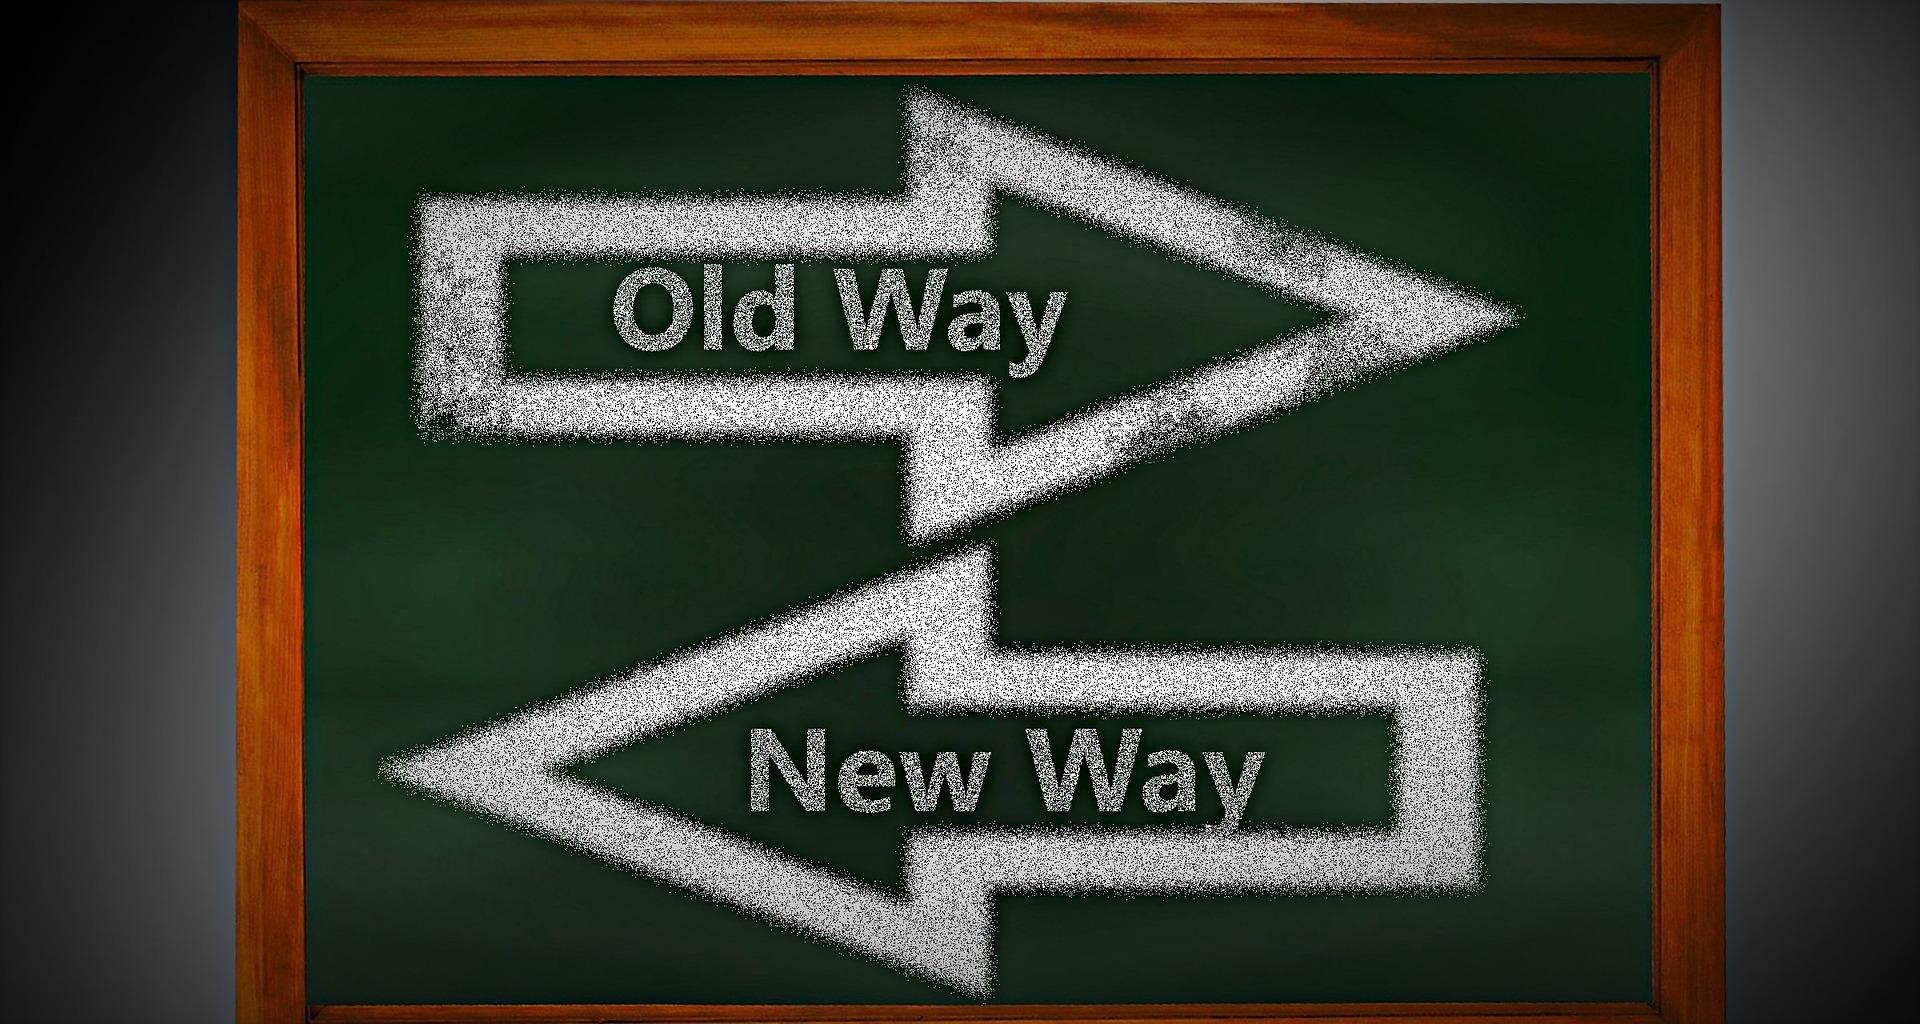 Nuevo camino